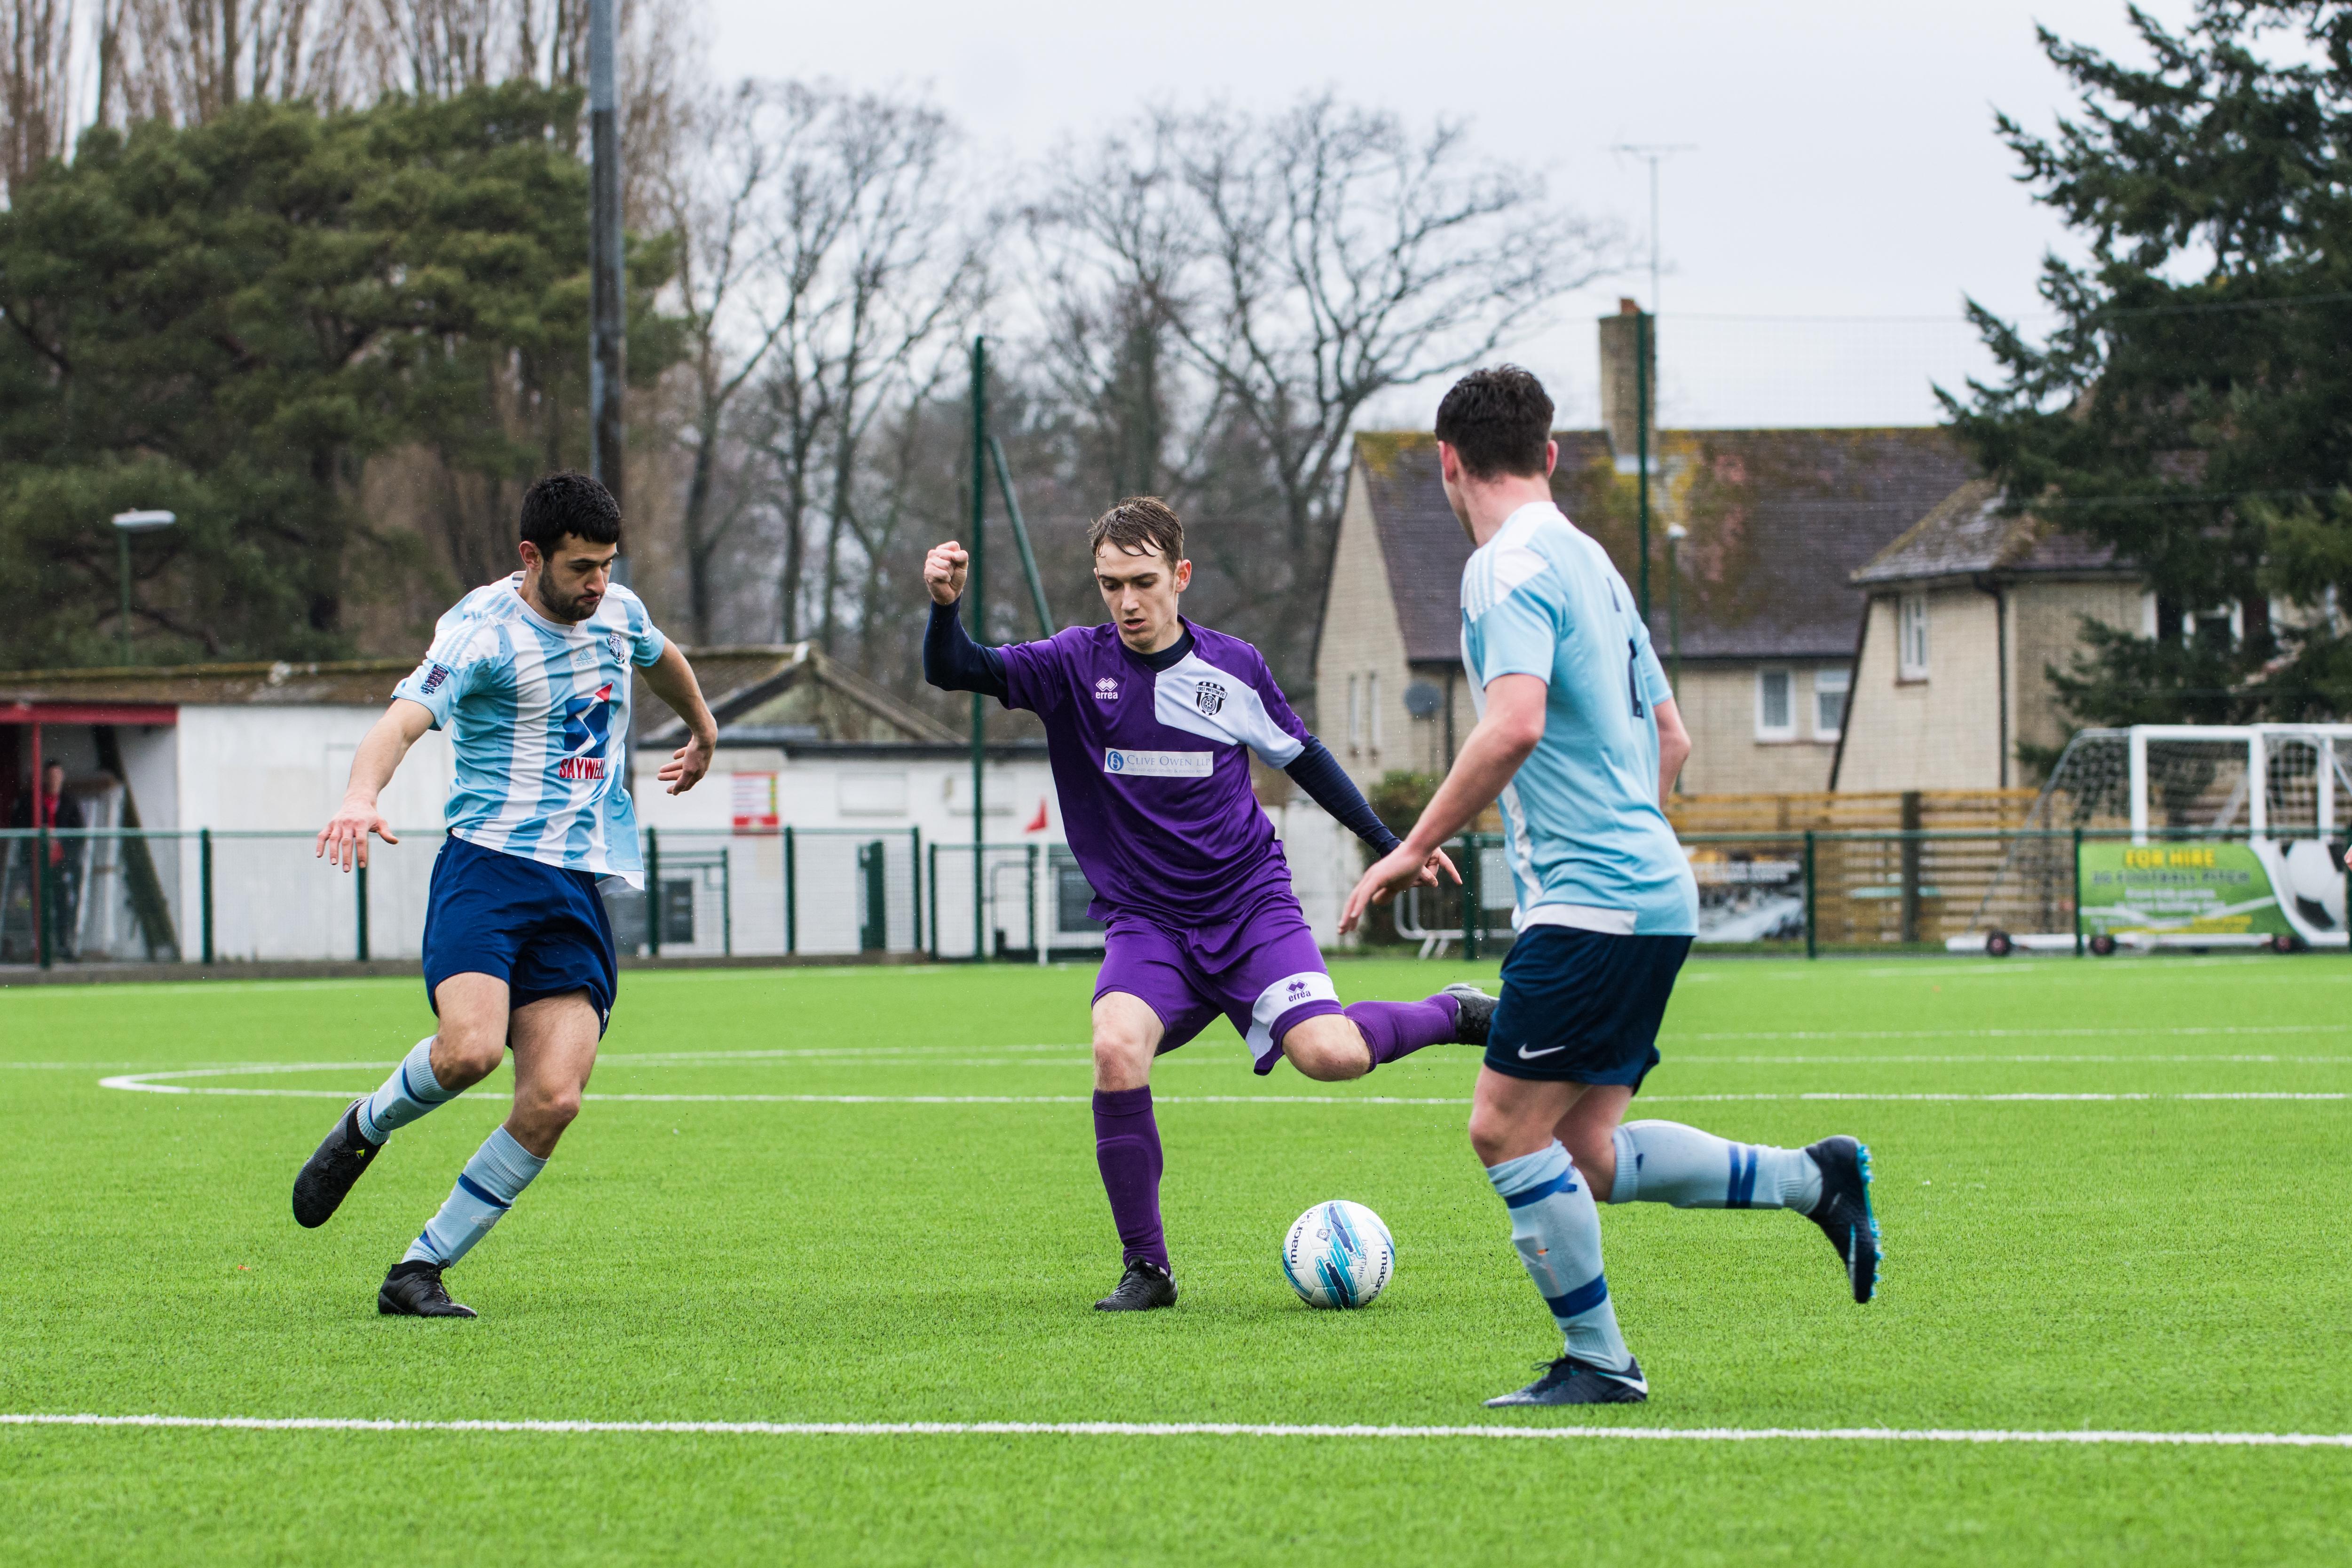 DAVID_JEFFERY Worthing United FC vs East Preston FC 02.04.18 51